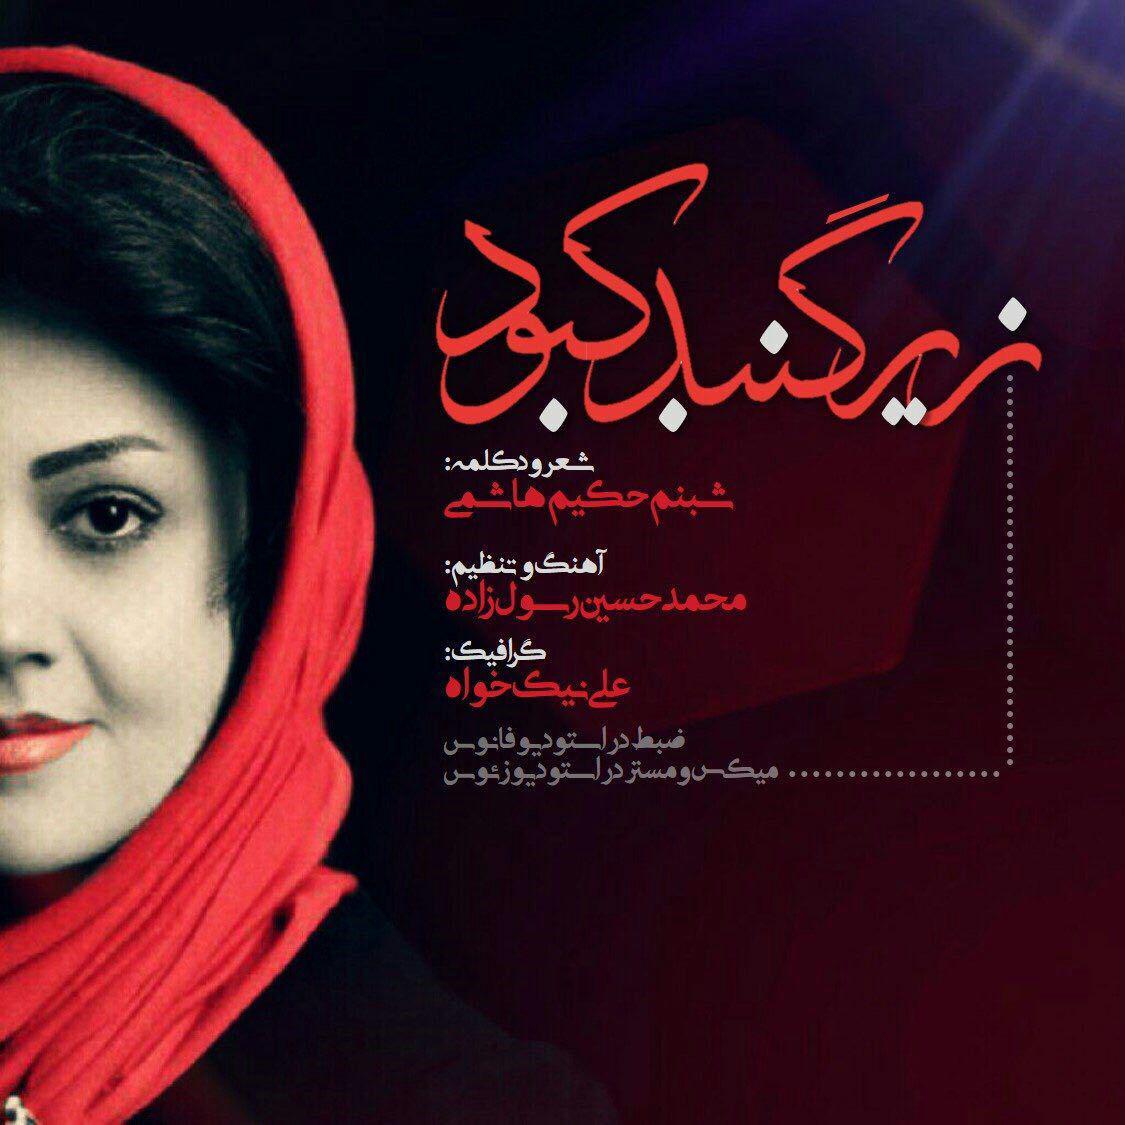 Shabnam Hakim Hashemi - Zire Gonbade Kabood